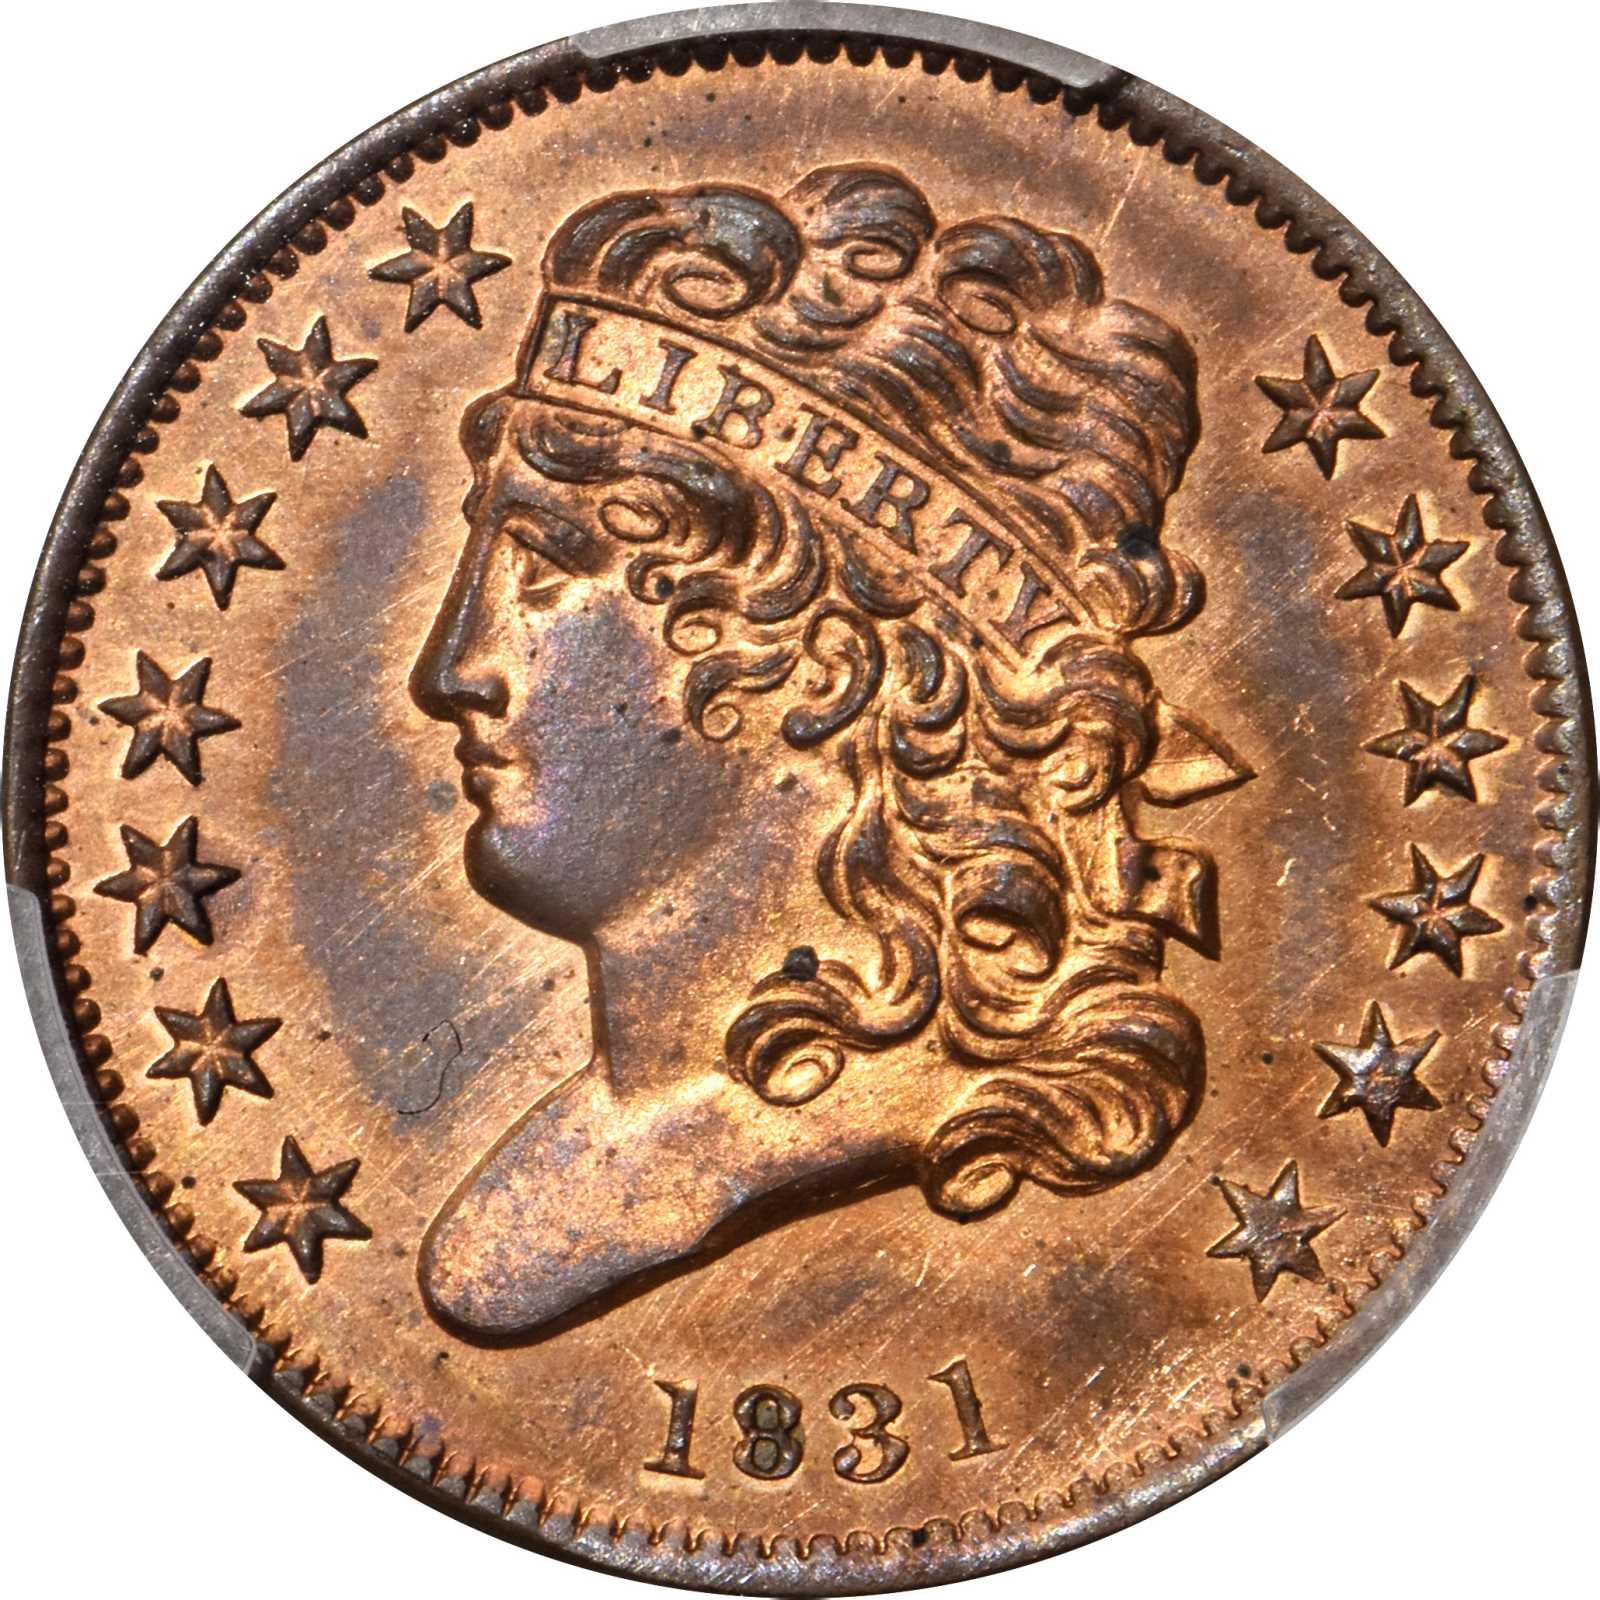 sample image for 1831 Res, Rev.1836 RB